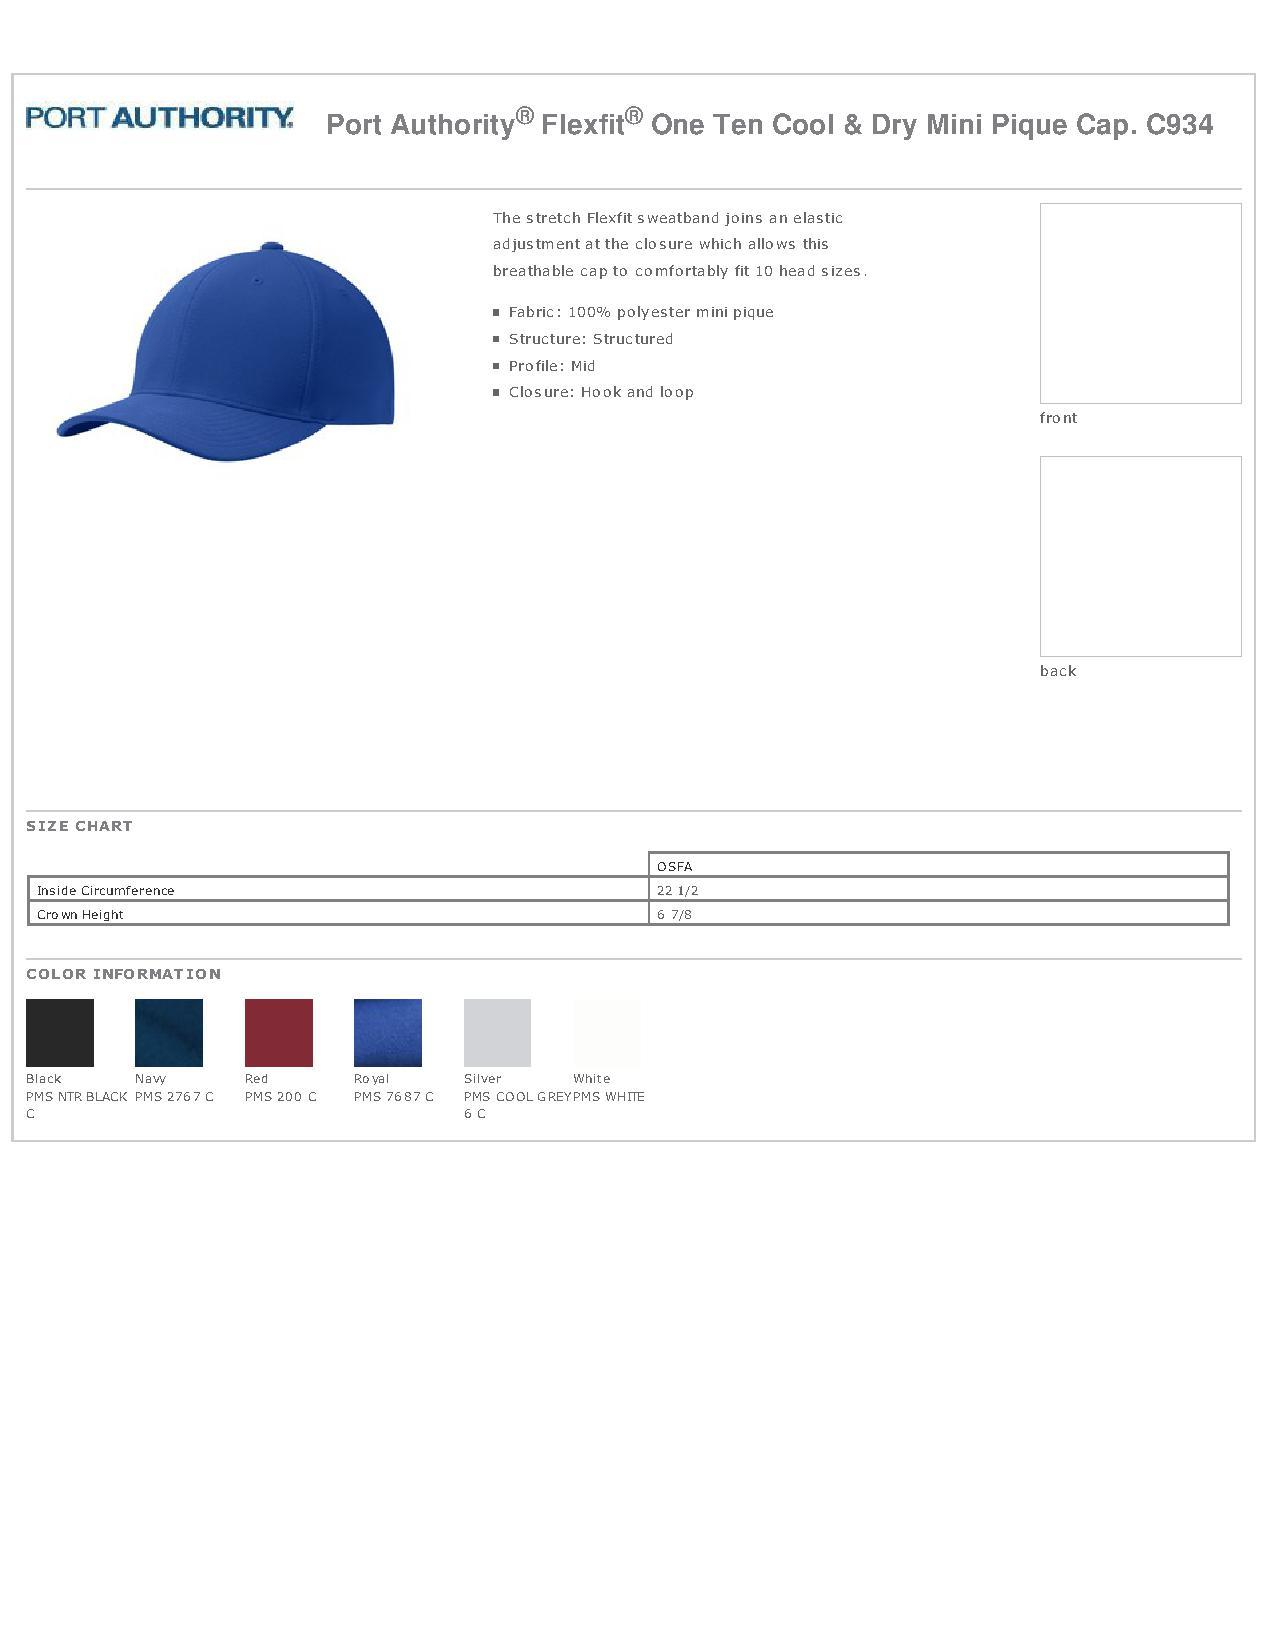 eb0985a94ec Port Authority C934 - Flexfit One Ten Cool   Dry Mini Pique Cap ...